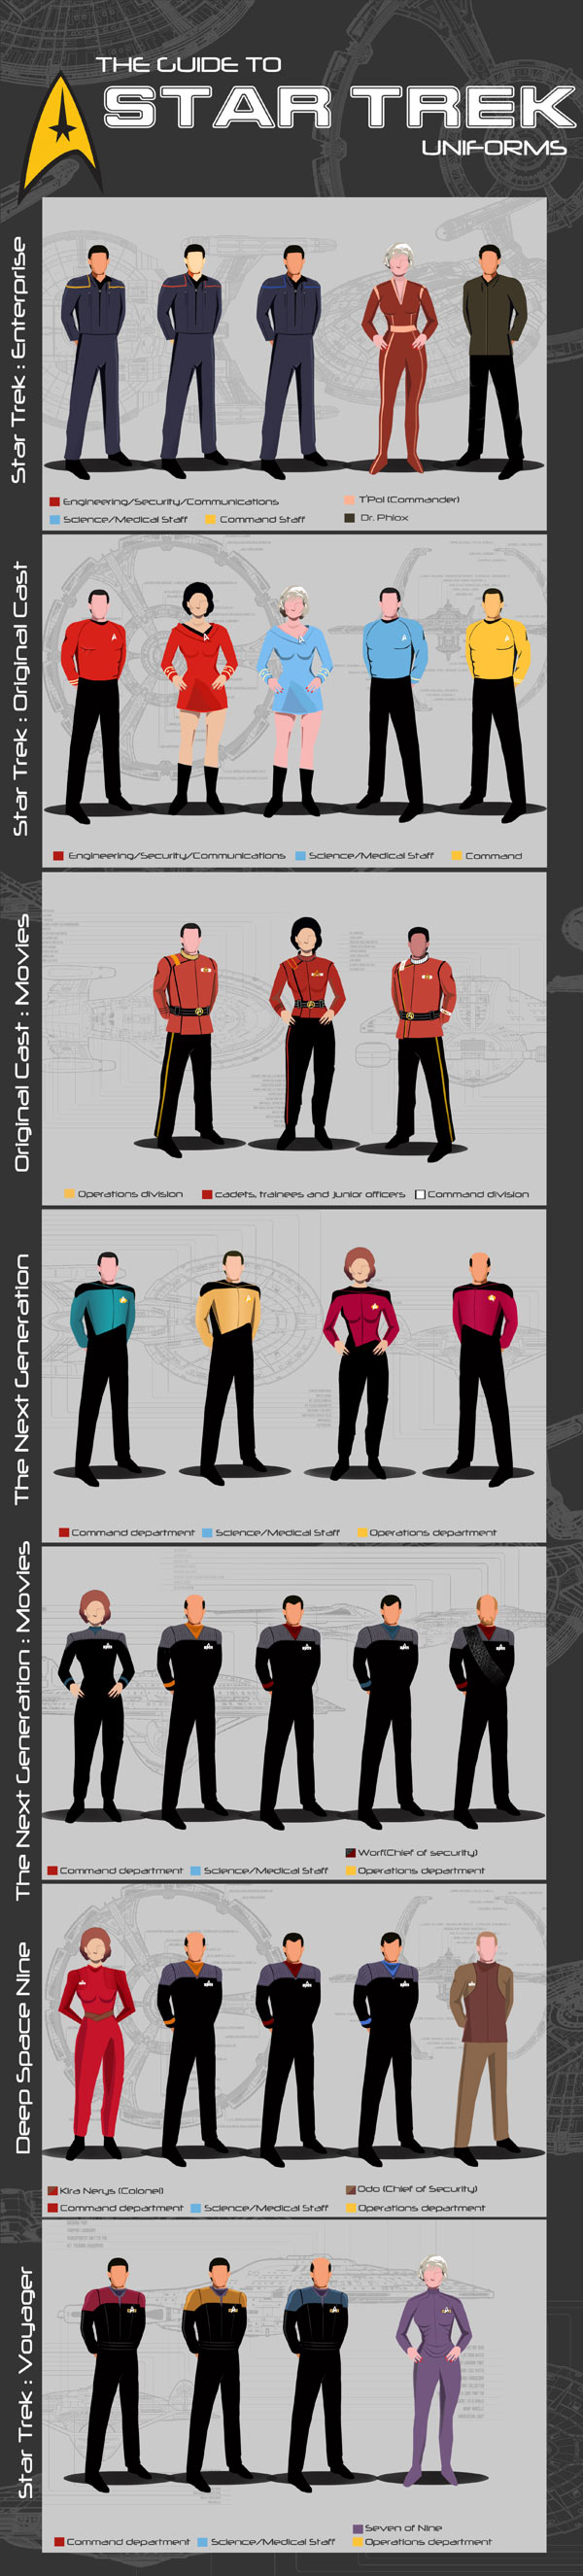 a guide to star trek uniforms.jpg